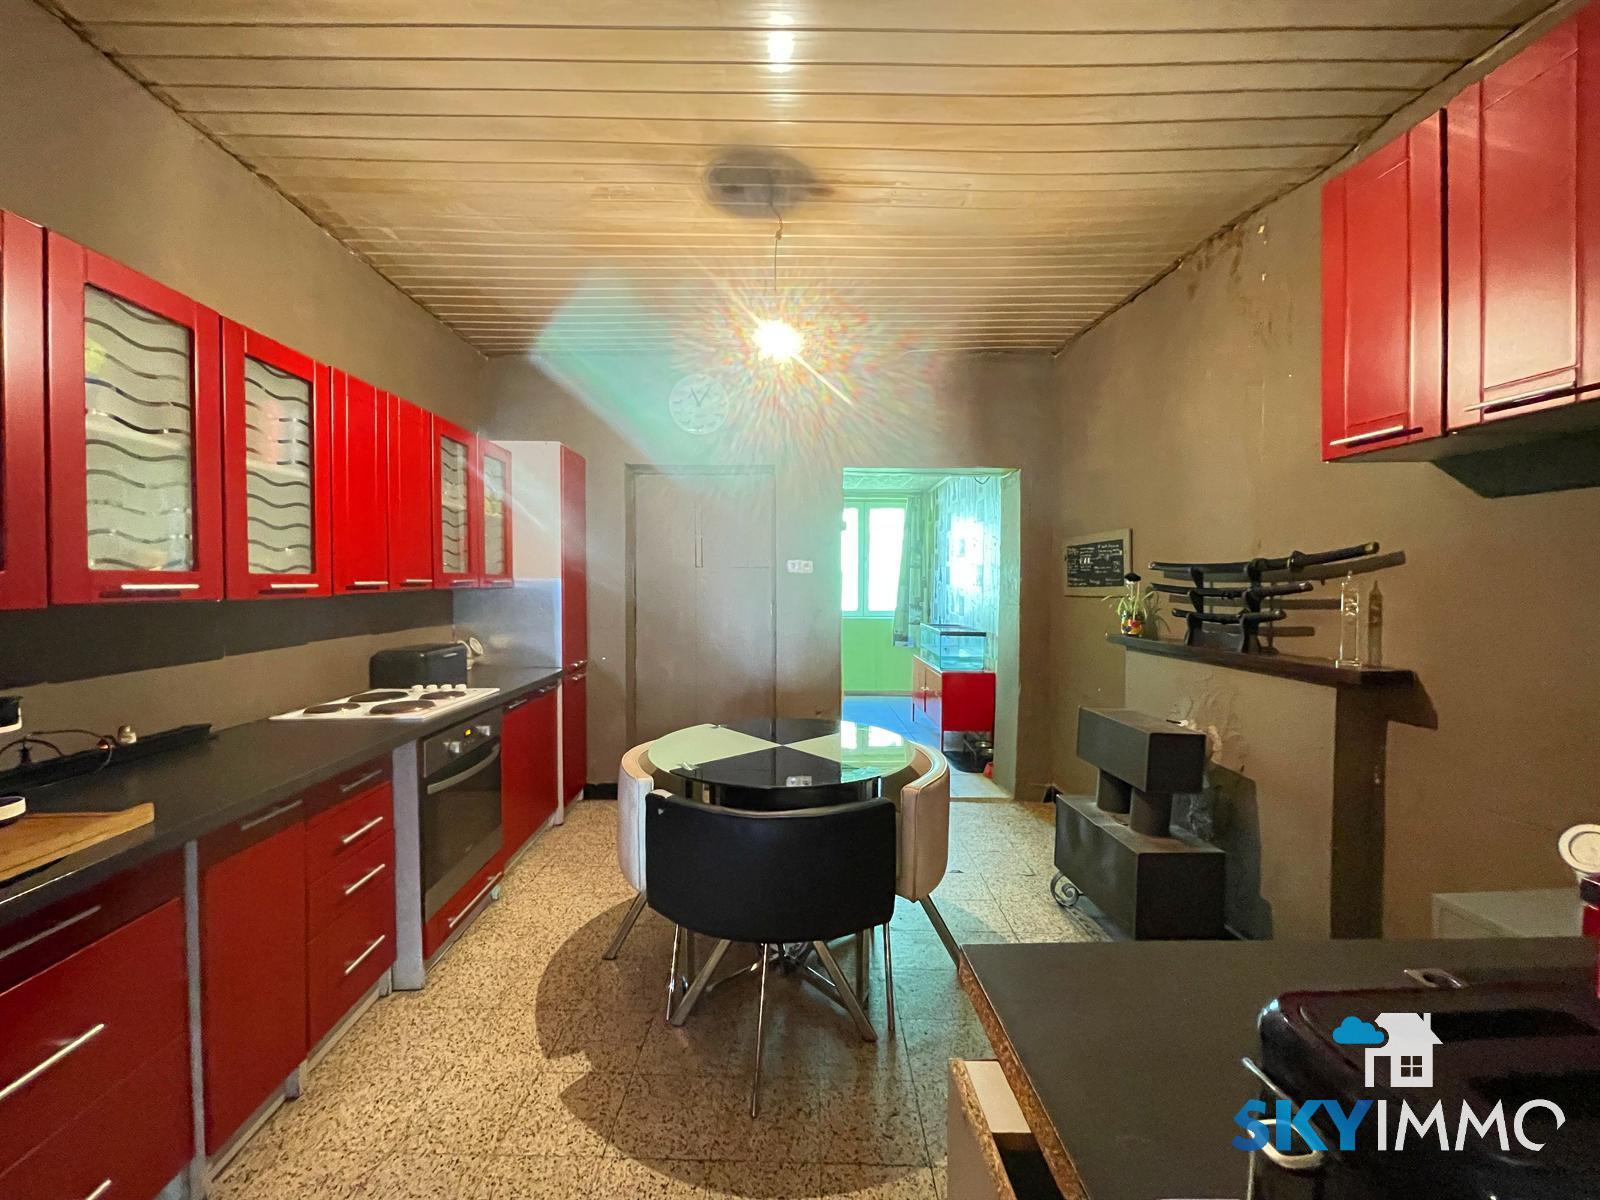 Maison - Seraing Jemeppesur-Meuse - #4517380-9